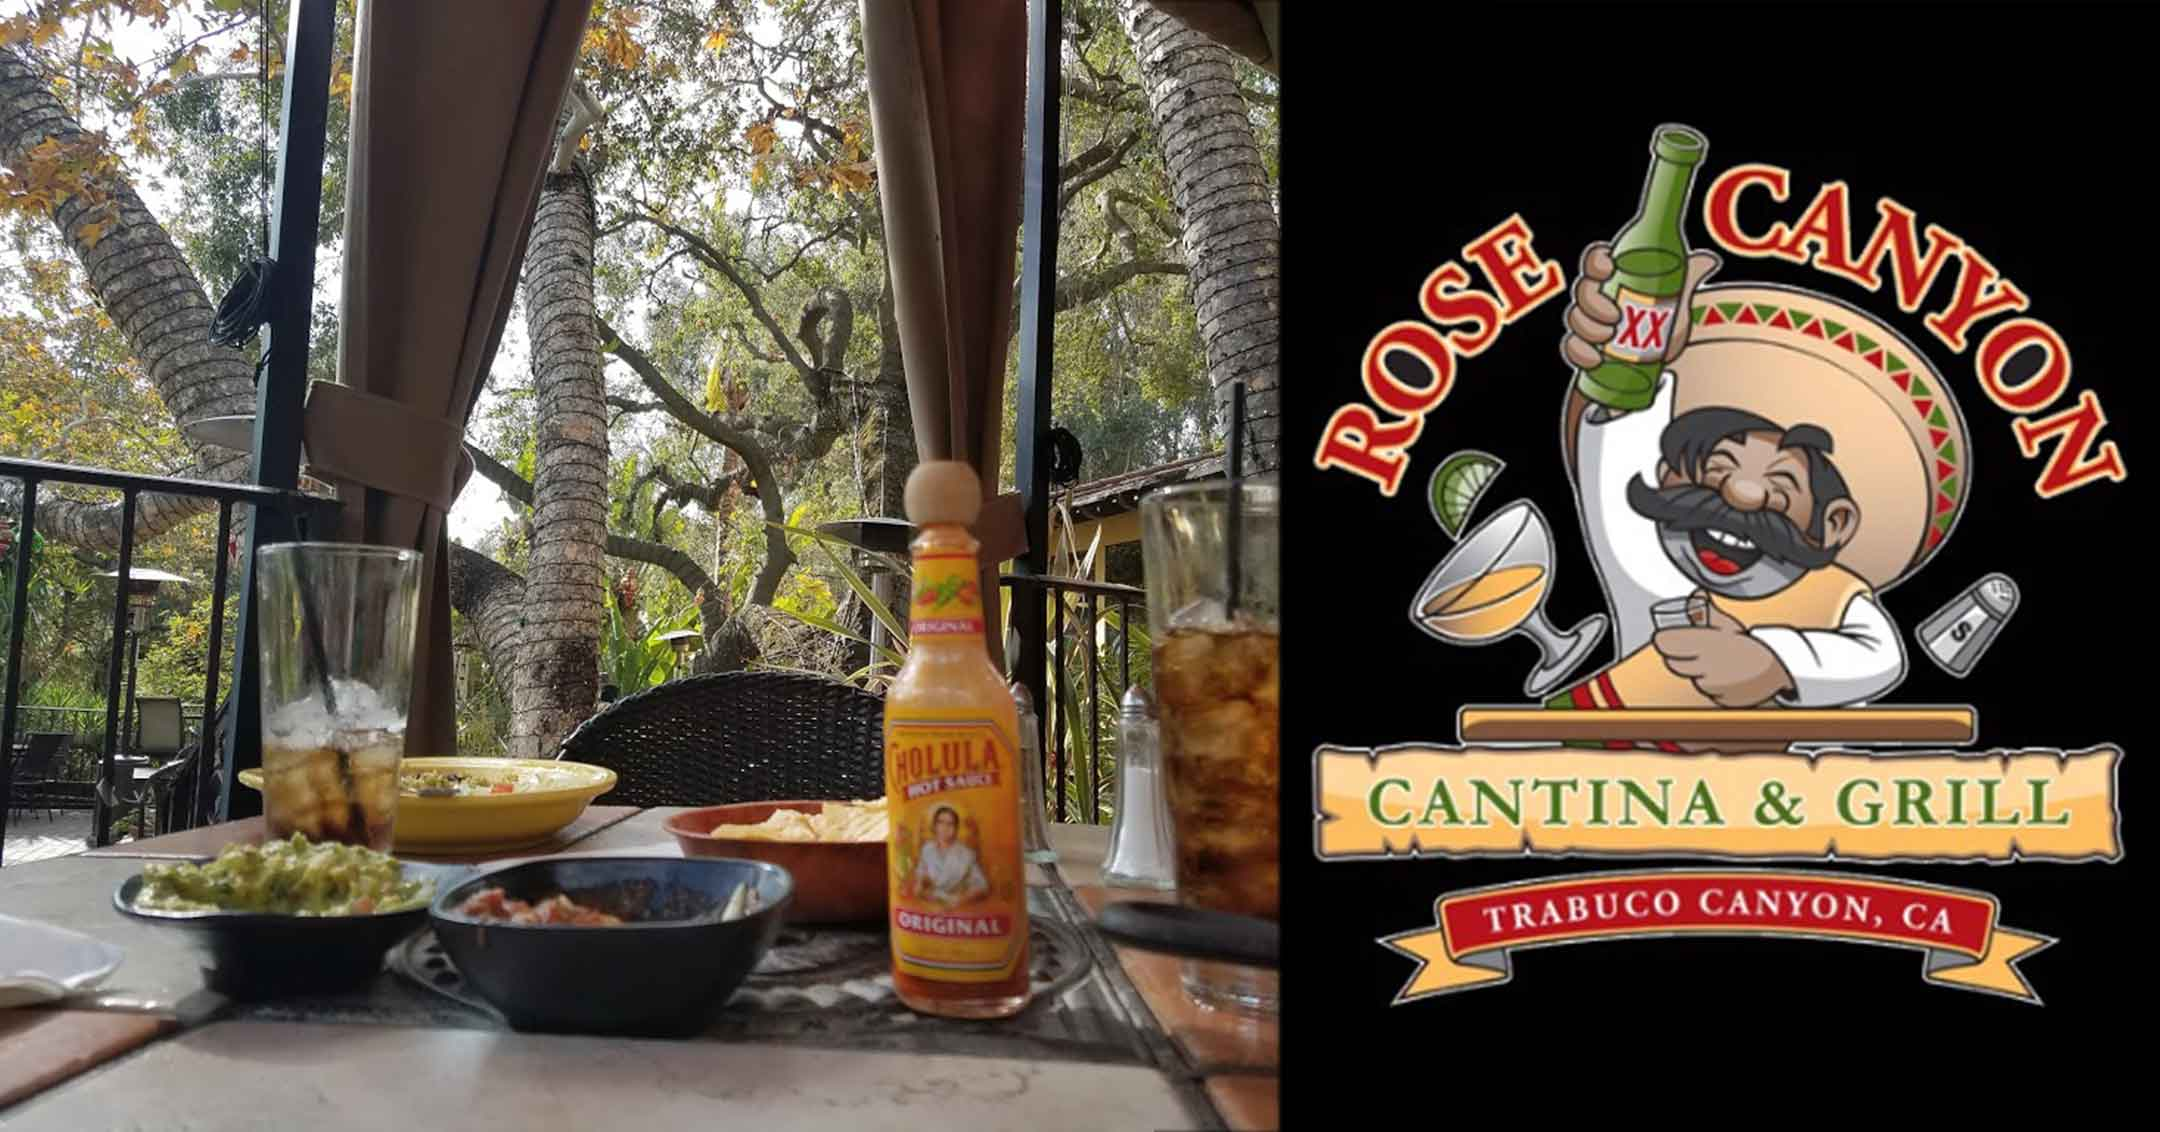 Rose Canyon Cantina & Grill | OCDeLoreans.com